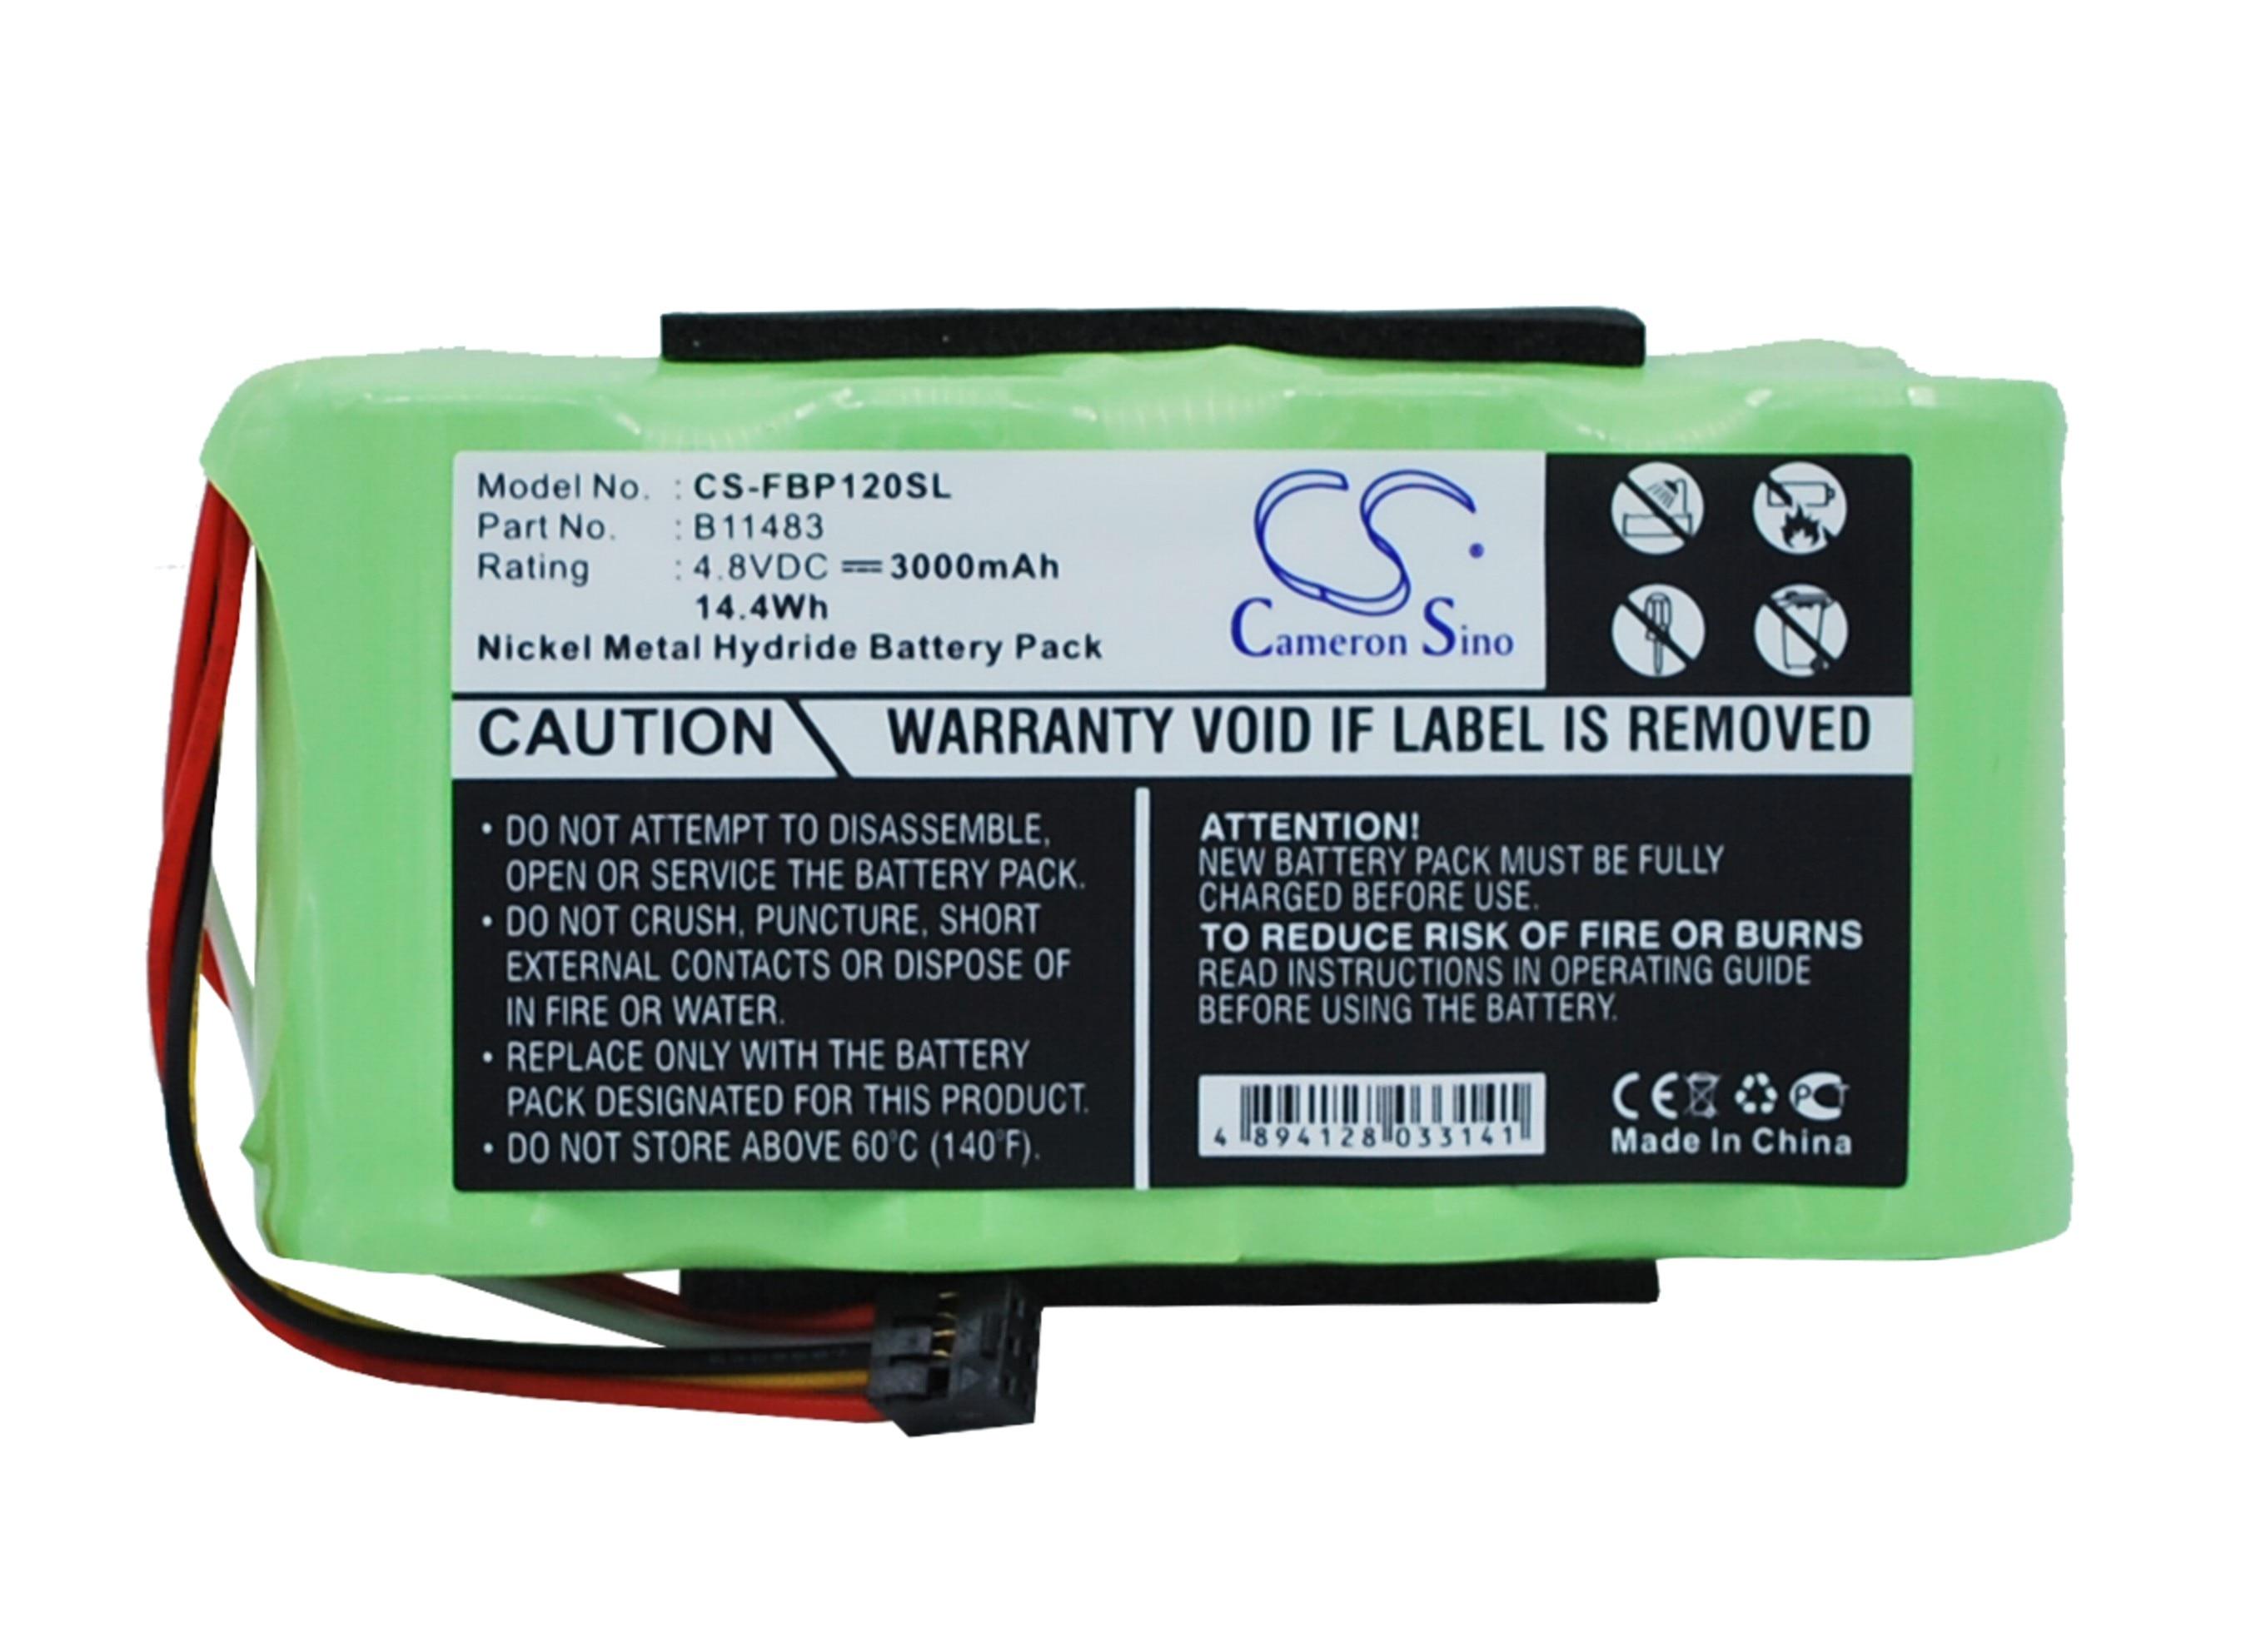 Аккумулятор Cameron Sino 3000 мАч для Fluke 123,Fluke 123S,Fluke 43B, Анализаторы качества мощности, Скоп 120,B11483 BP120MH недорого